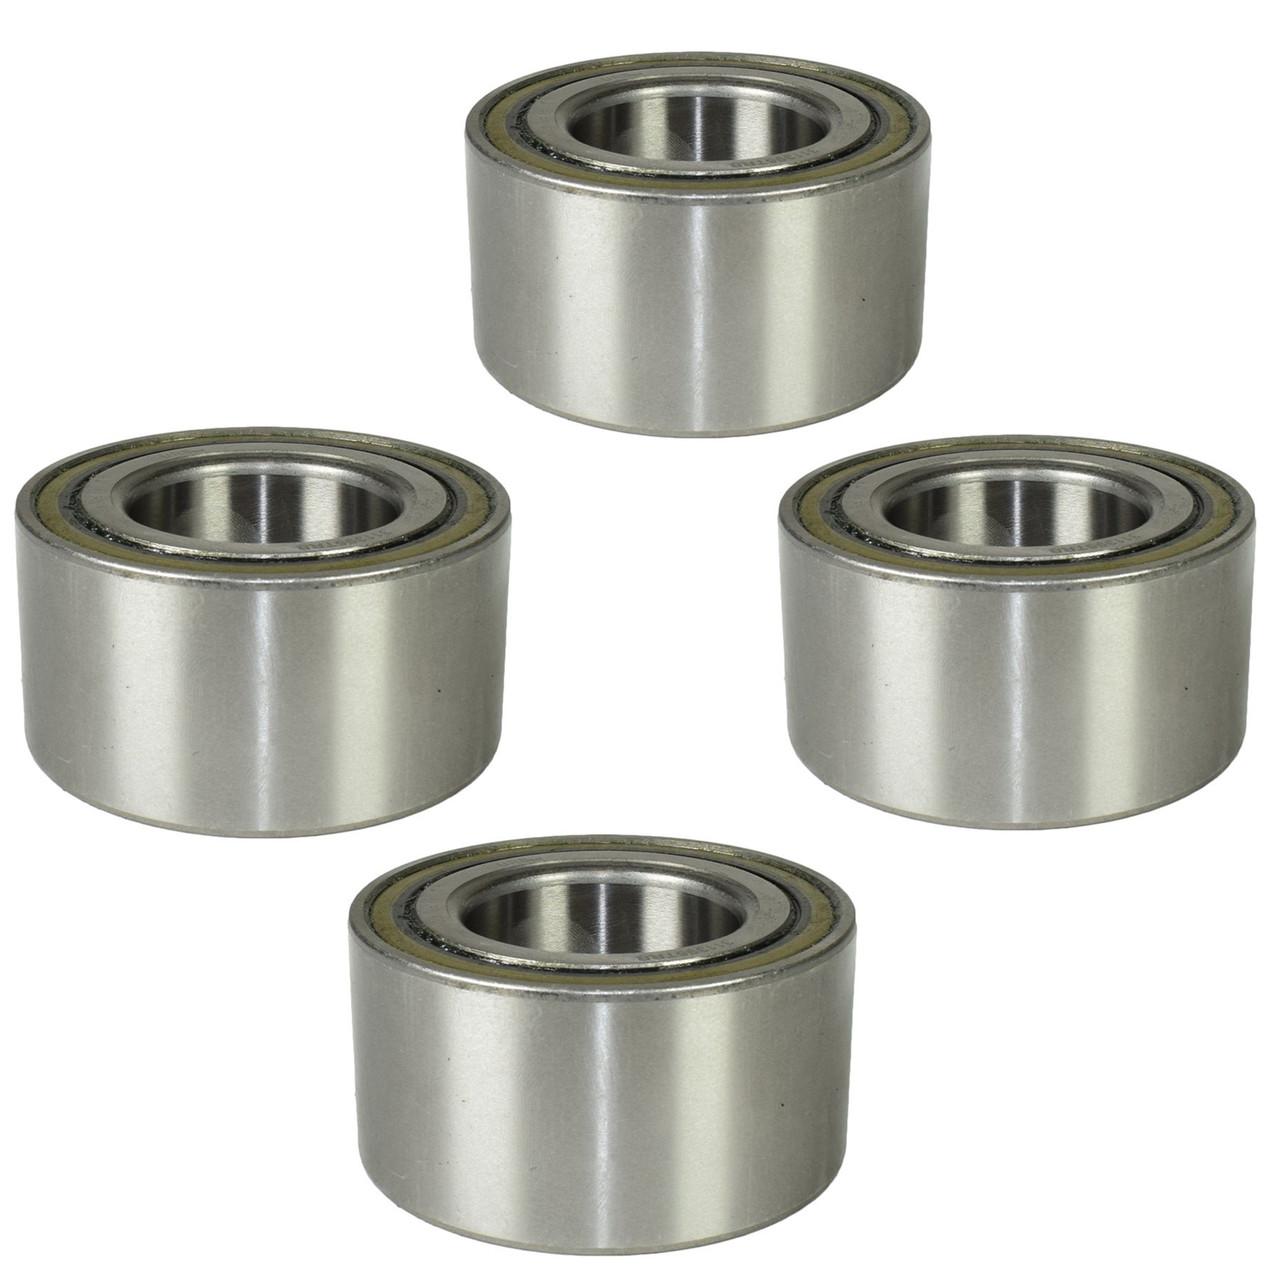 Trailer Sealed Bearing Hubs Knott Avonride 45887.11 ALKO 581169 ID39 OD72 W37mm